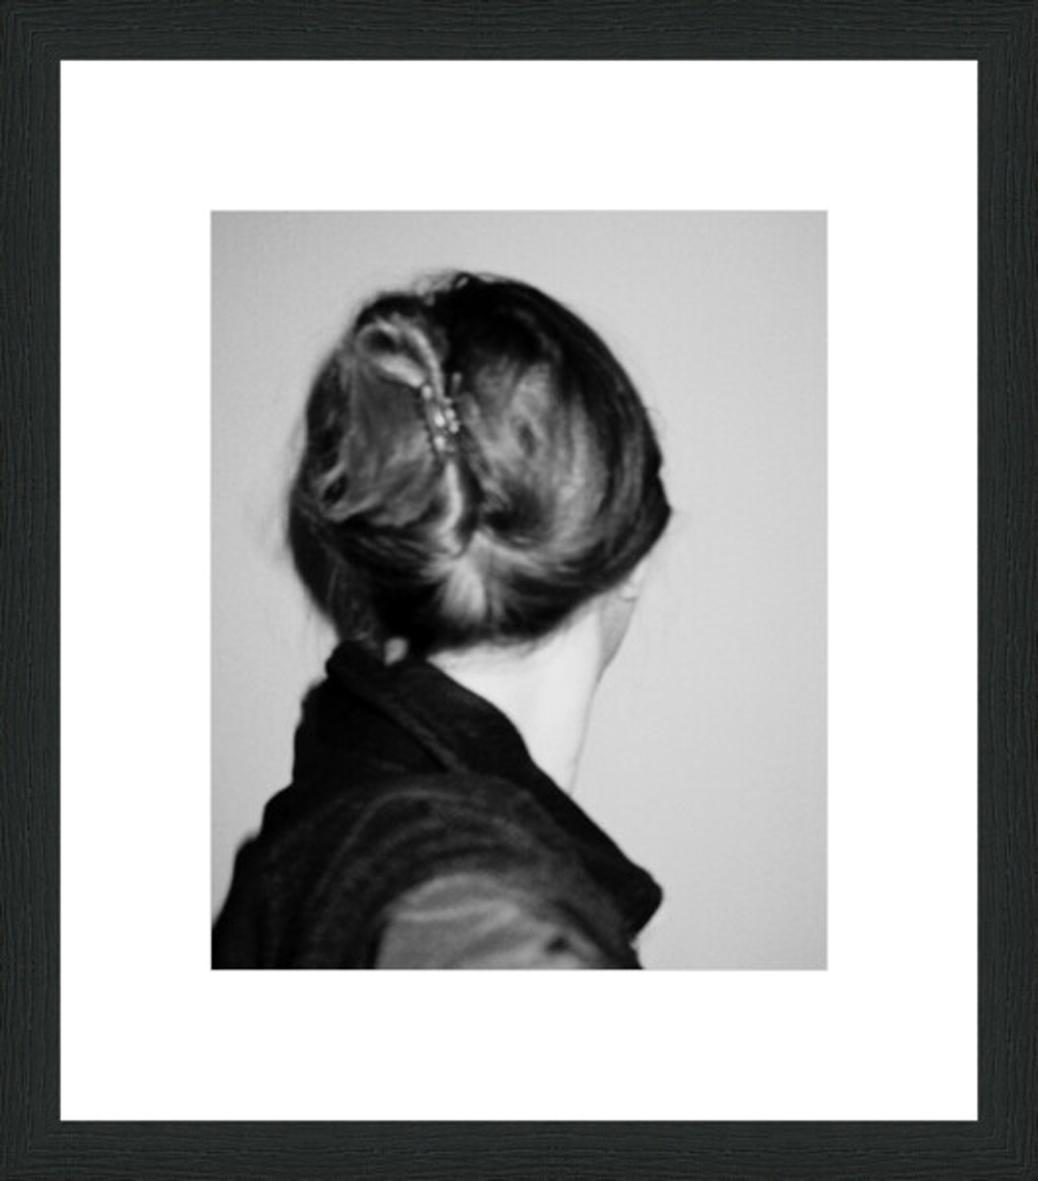 Self-portrait 12 11 25